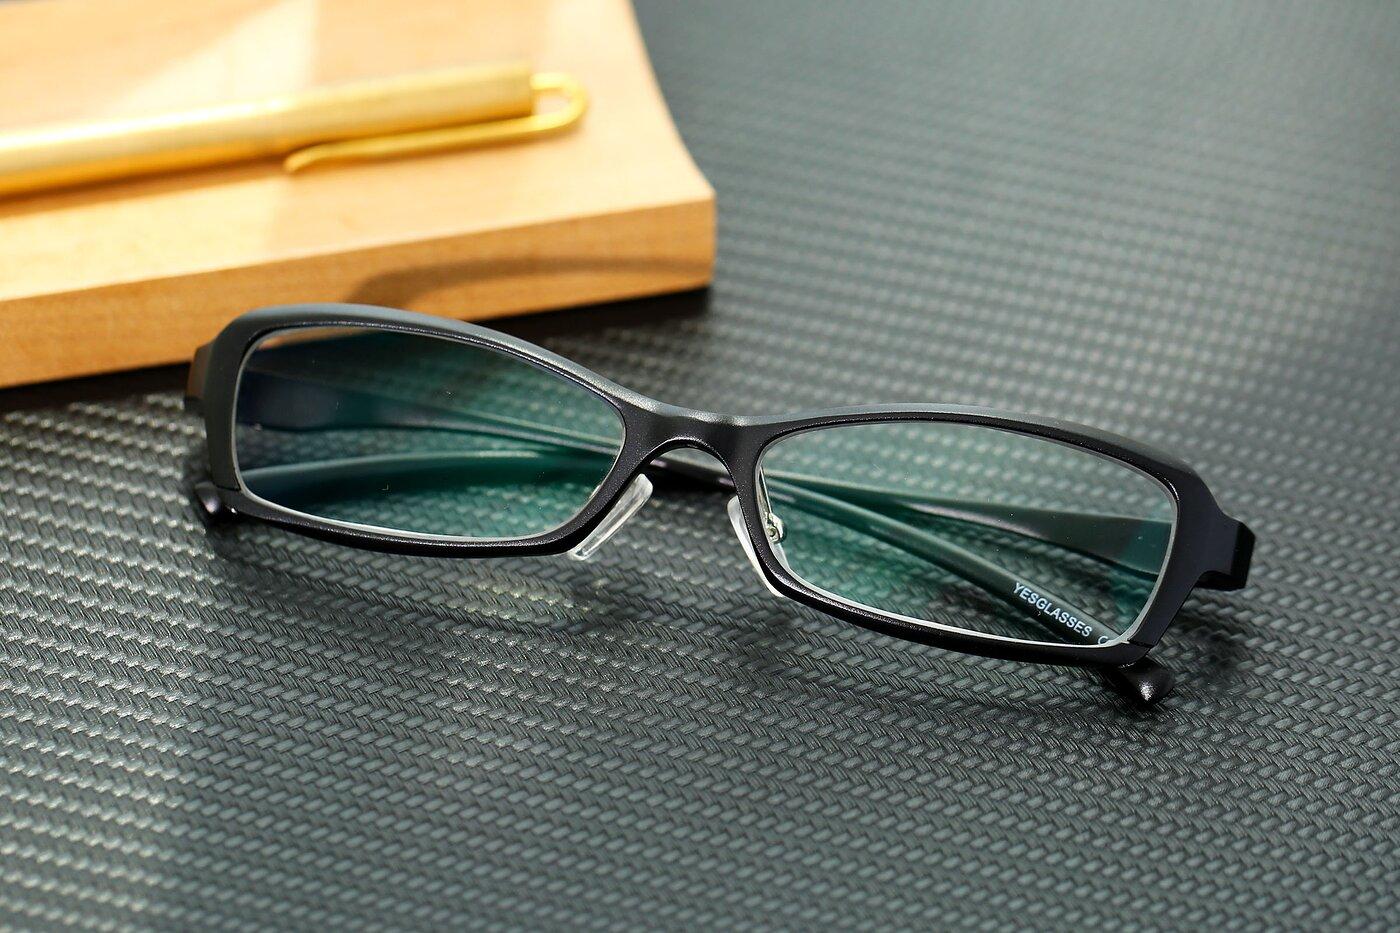 Black Magnesium Alloy Rectangle Full-Rim Eyeglasses